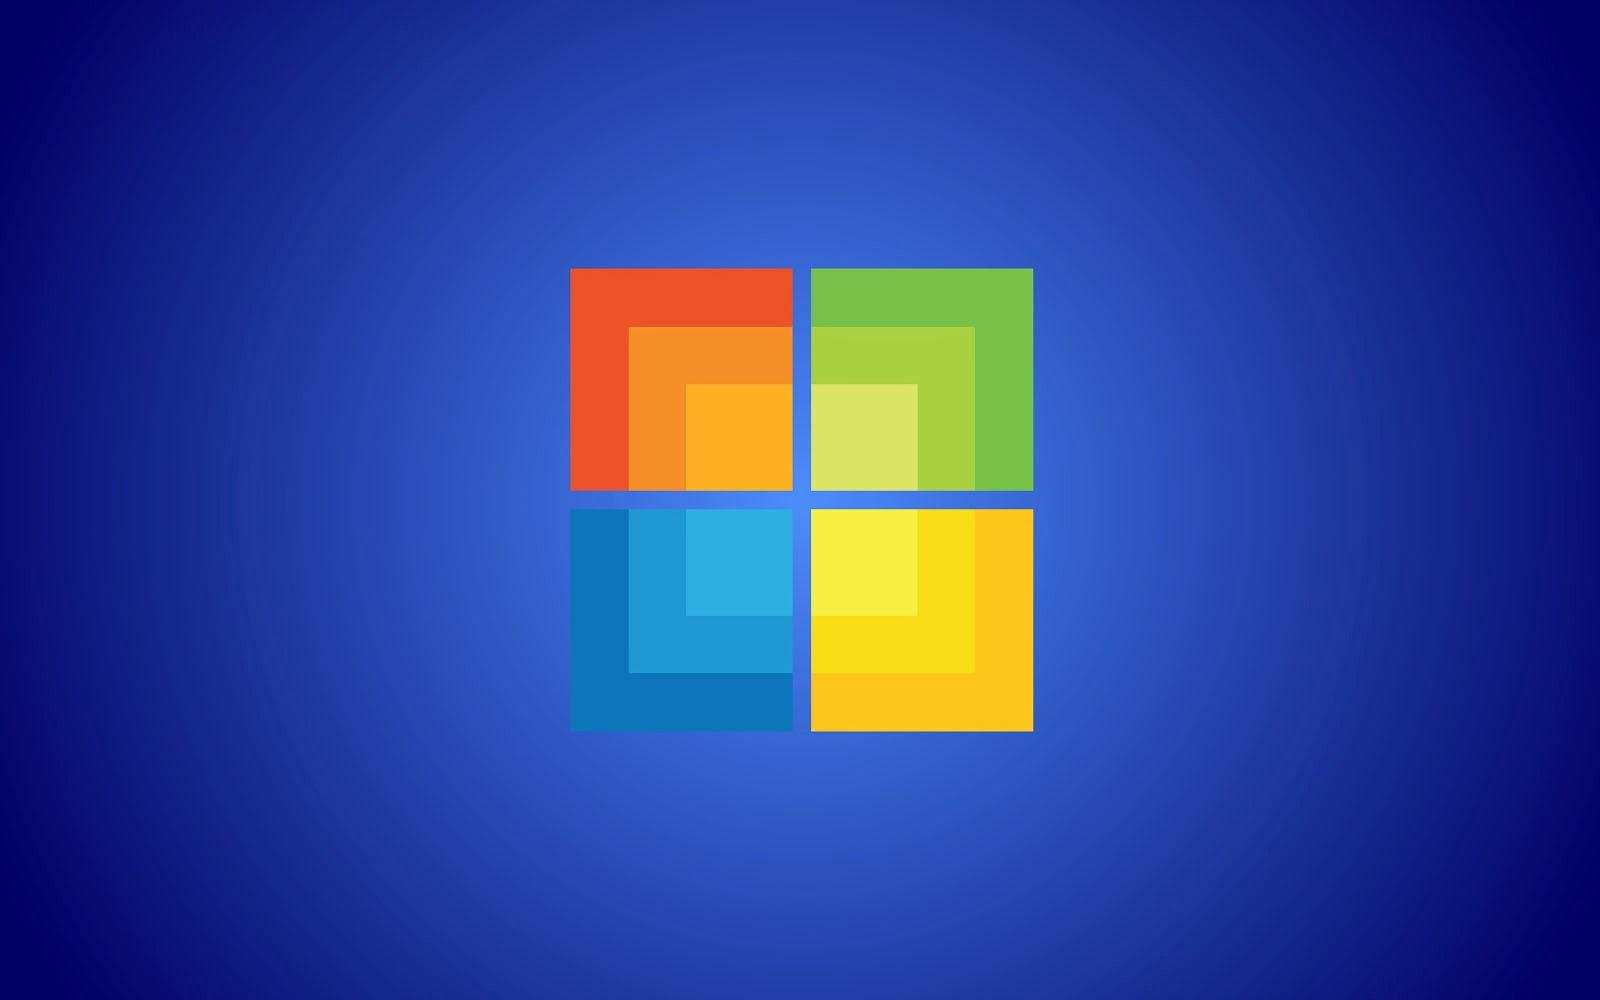 Clovisso Wallpaper Gallery: Microsoft Windows Wallpapers